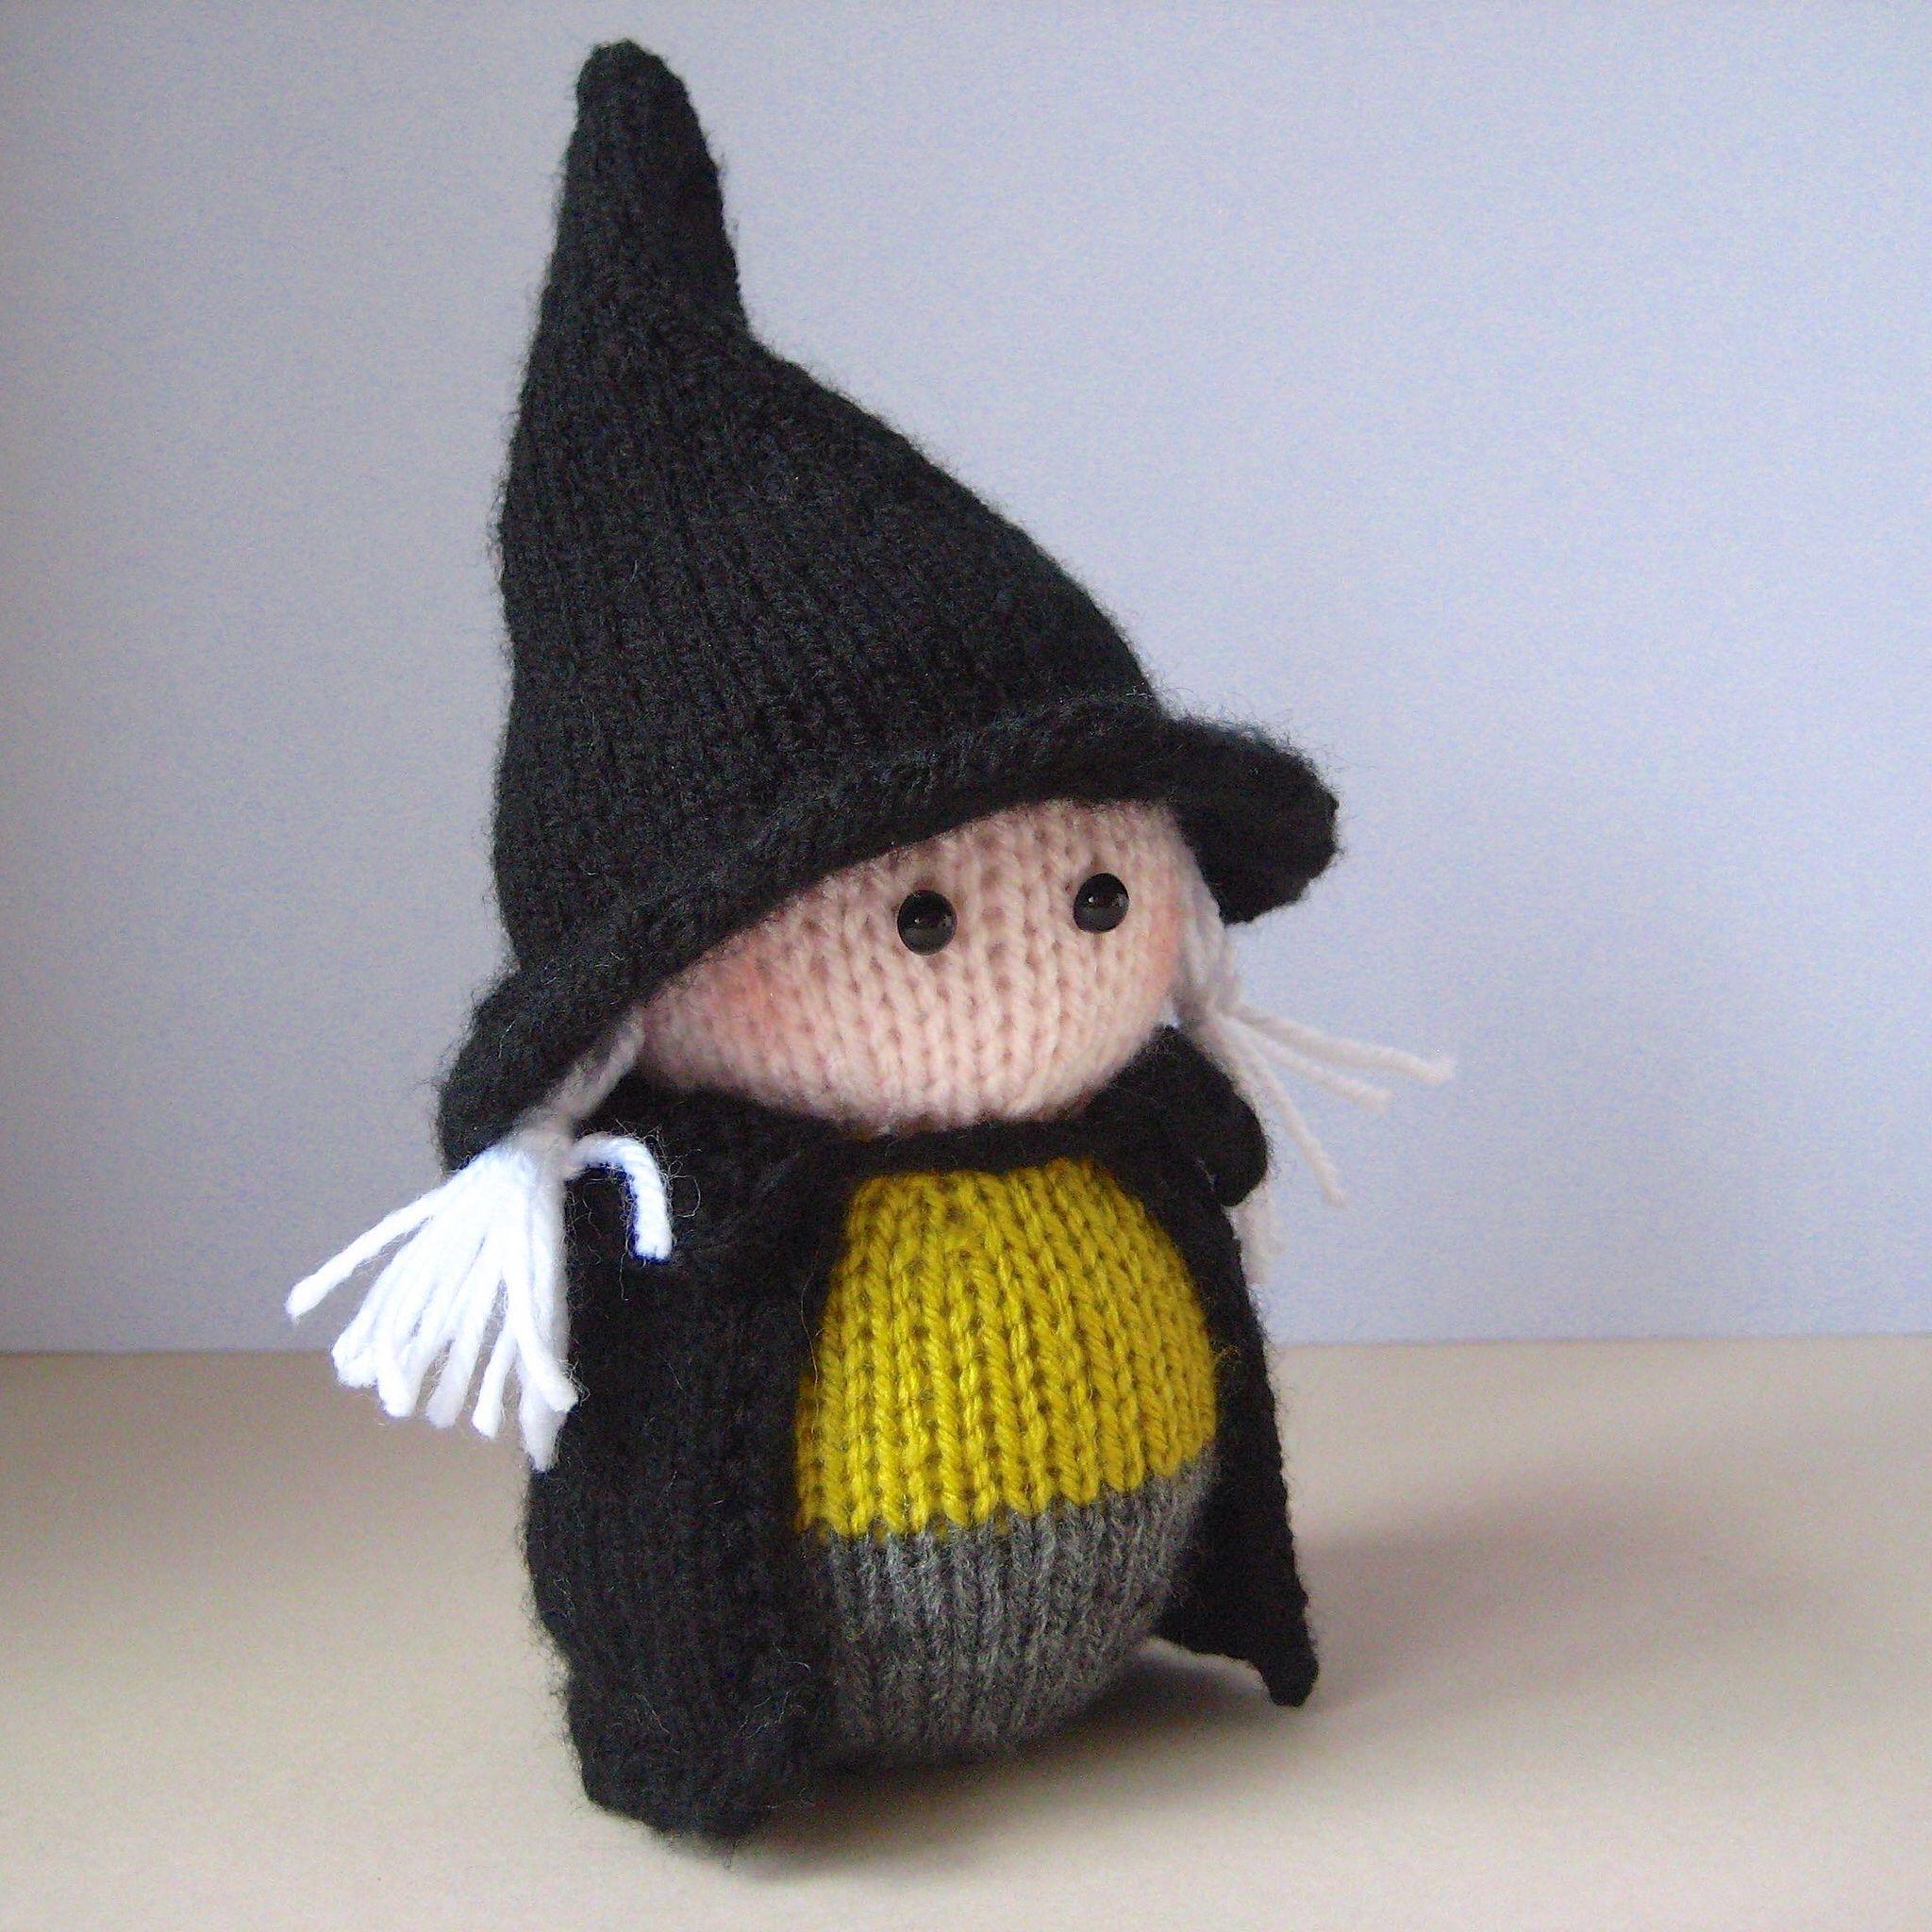 Wanda the Witch | Dessert ideas | Pinterest | Witches, Halloween ...